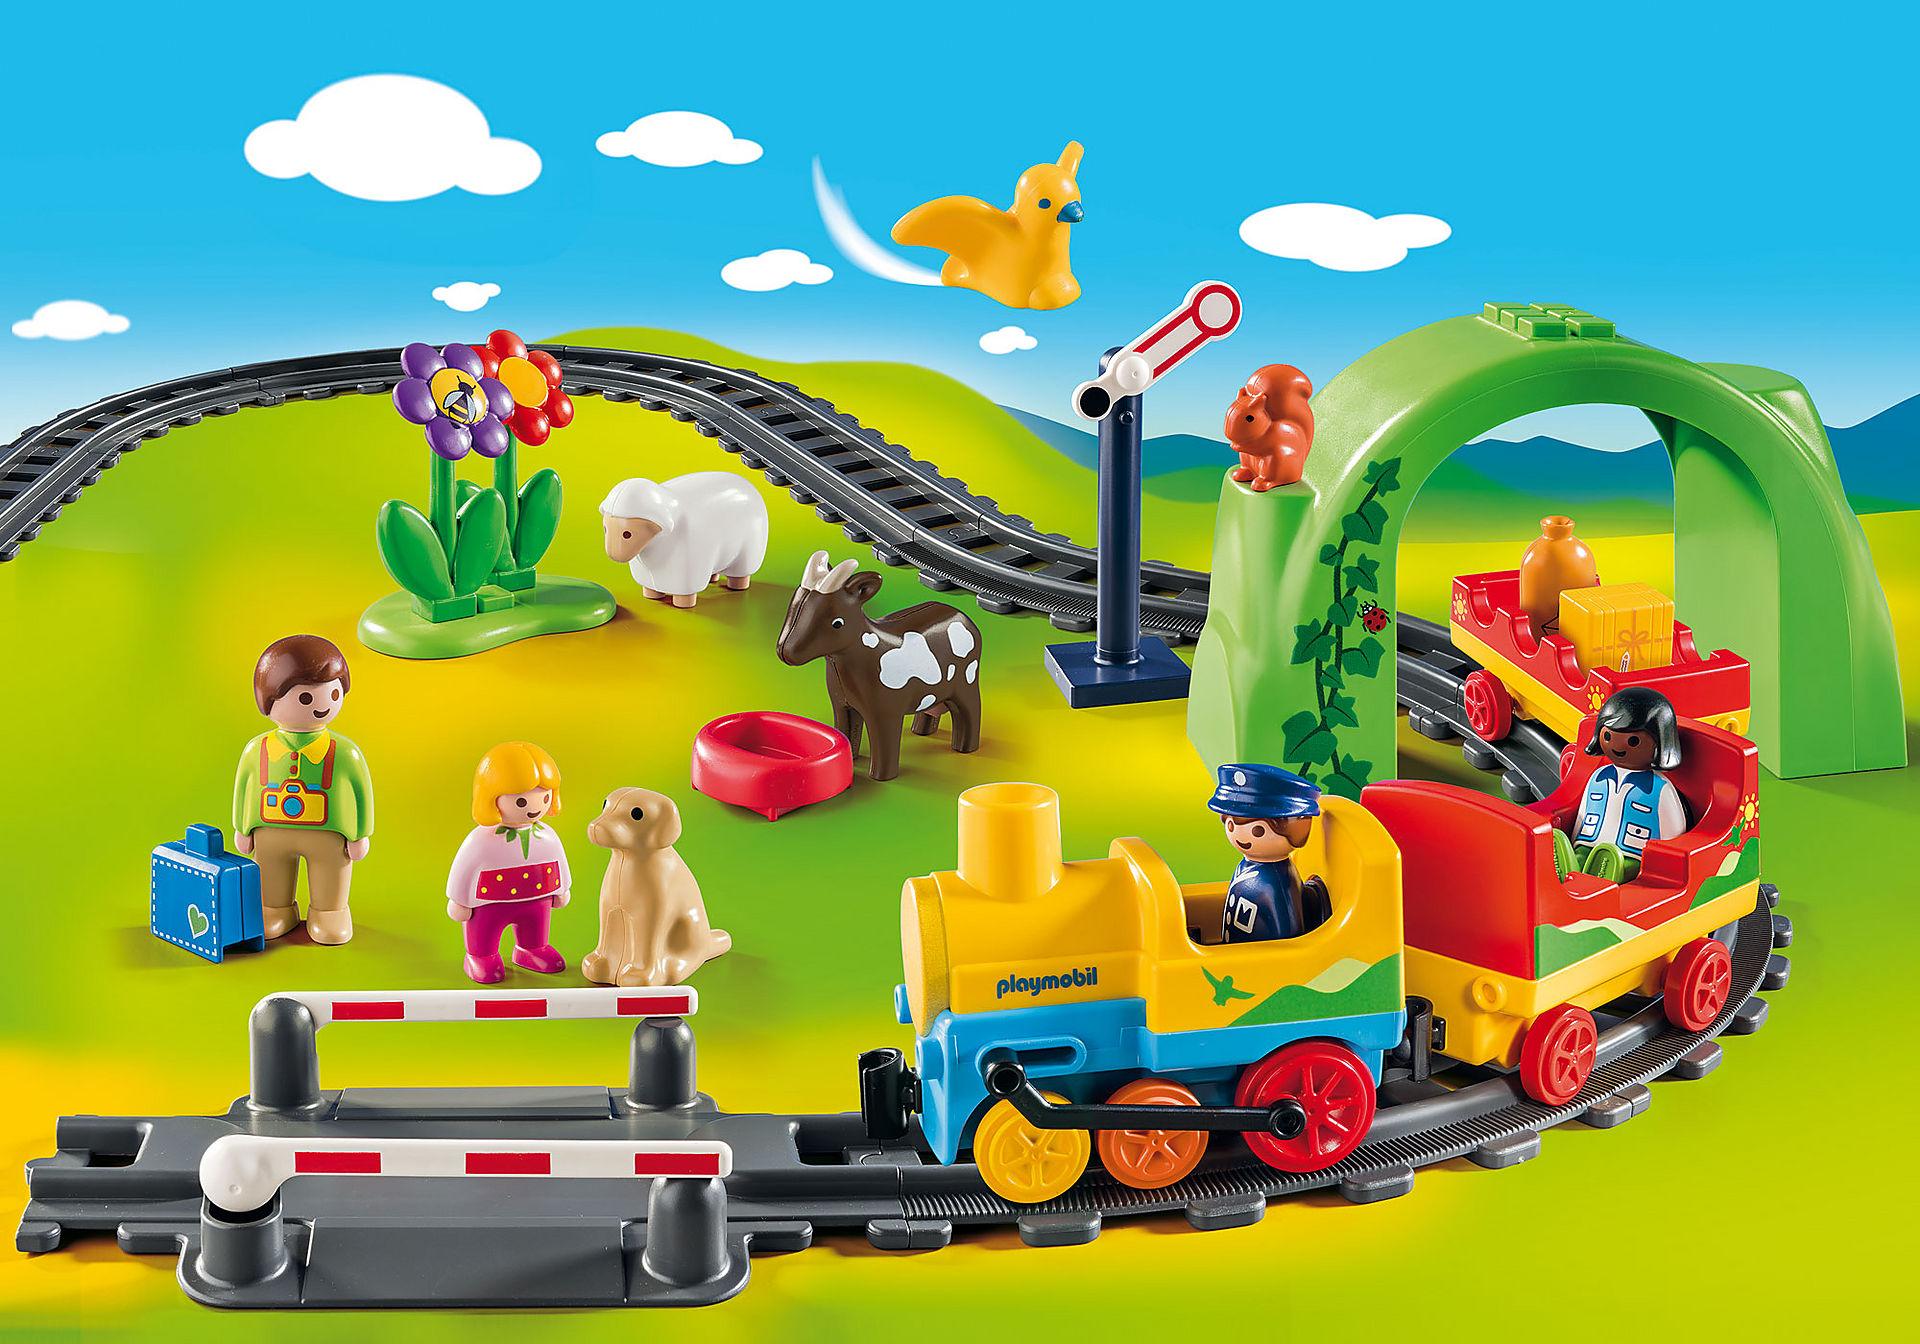 http://media.playmobil.com/i/playmobil/70179_product_detail/My first train set